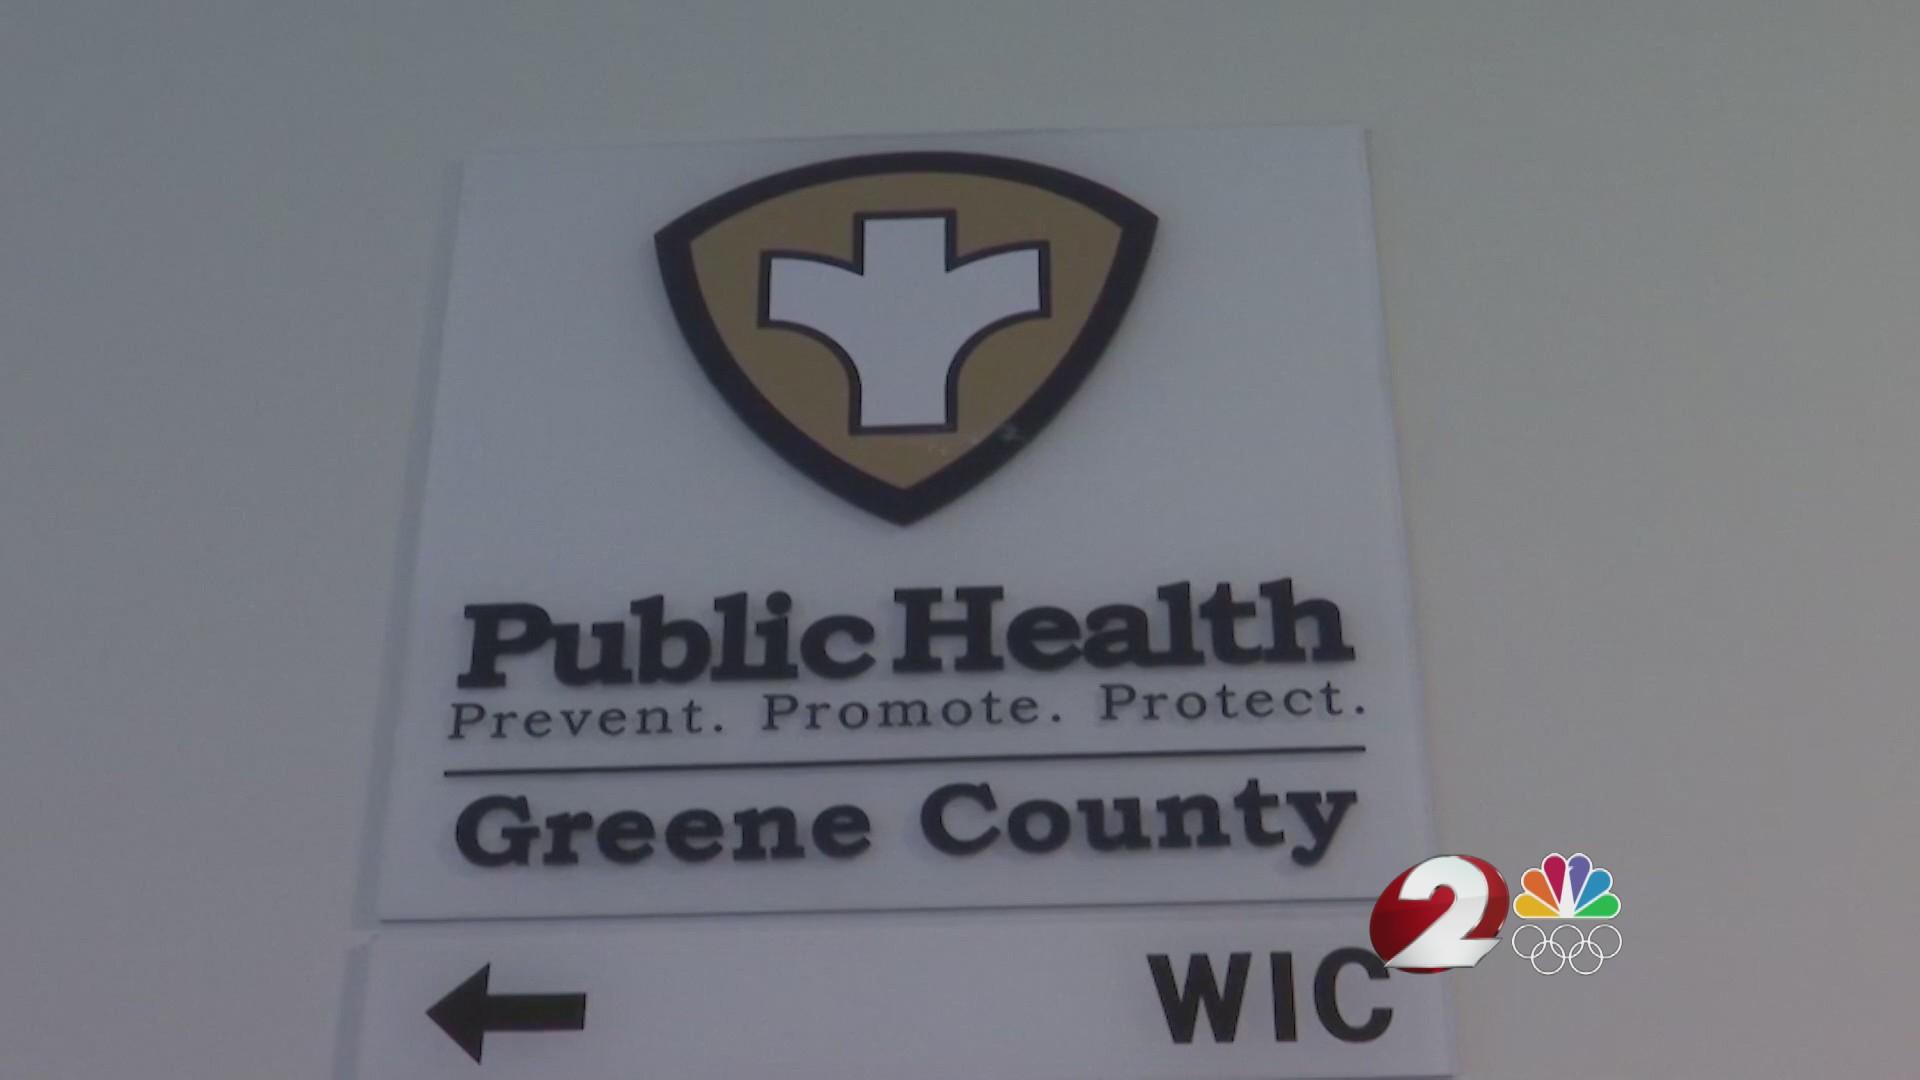 Greene County Public Health